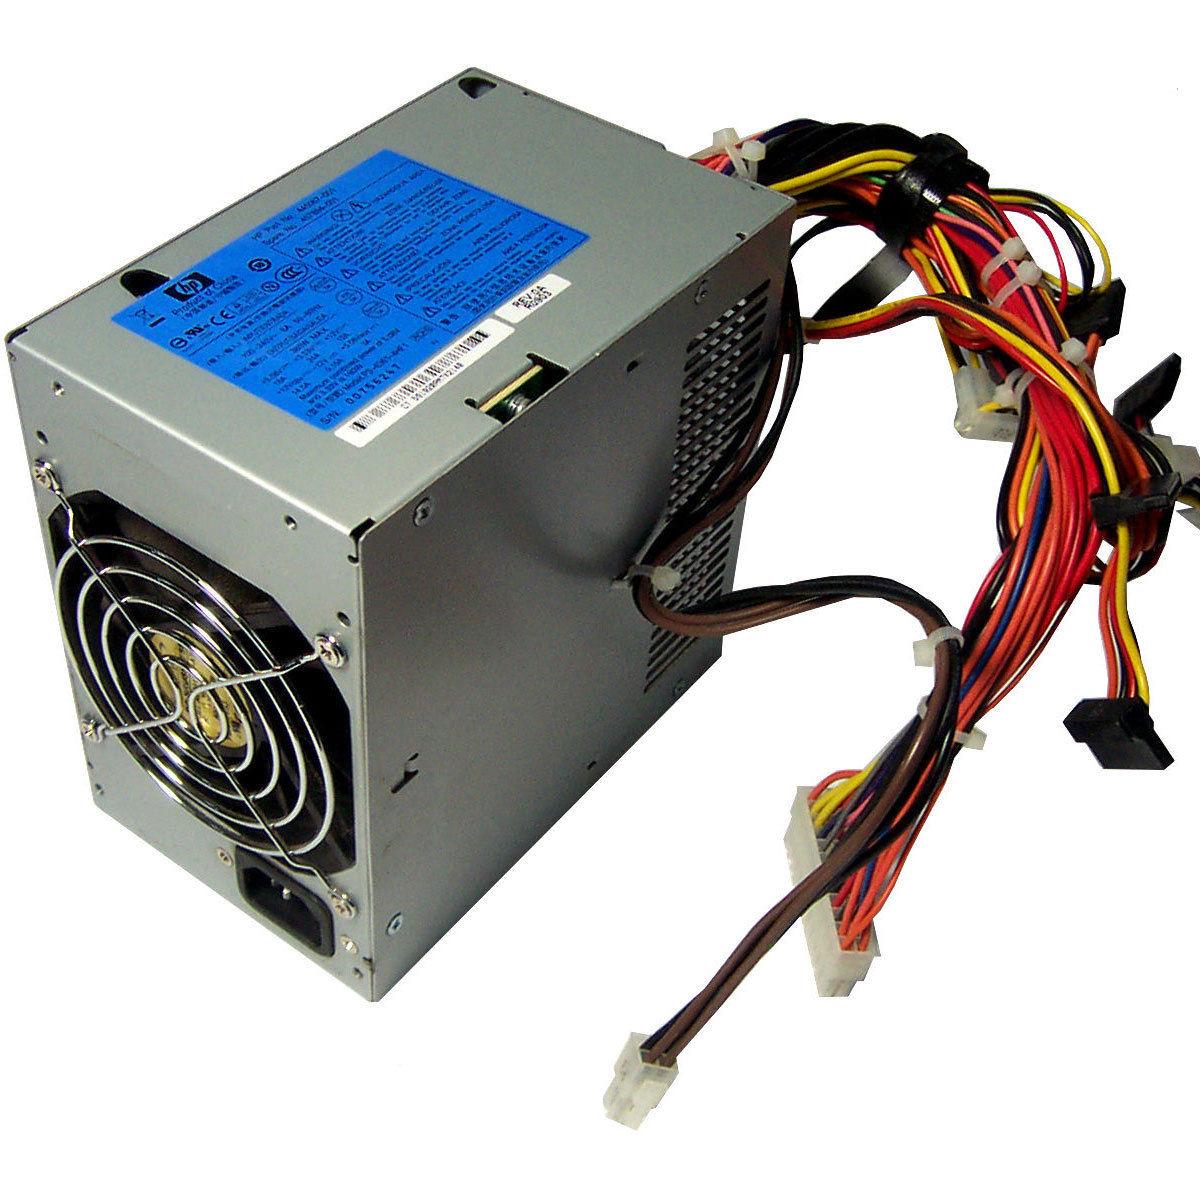 HP ML 110 G5 365W Power Supply